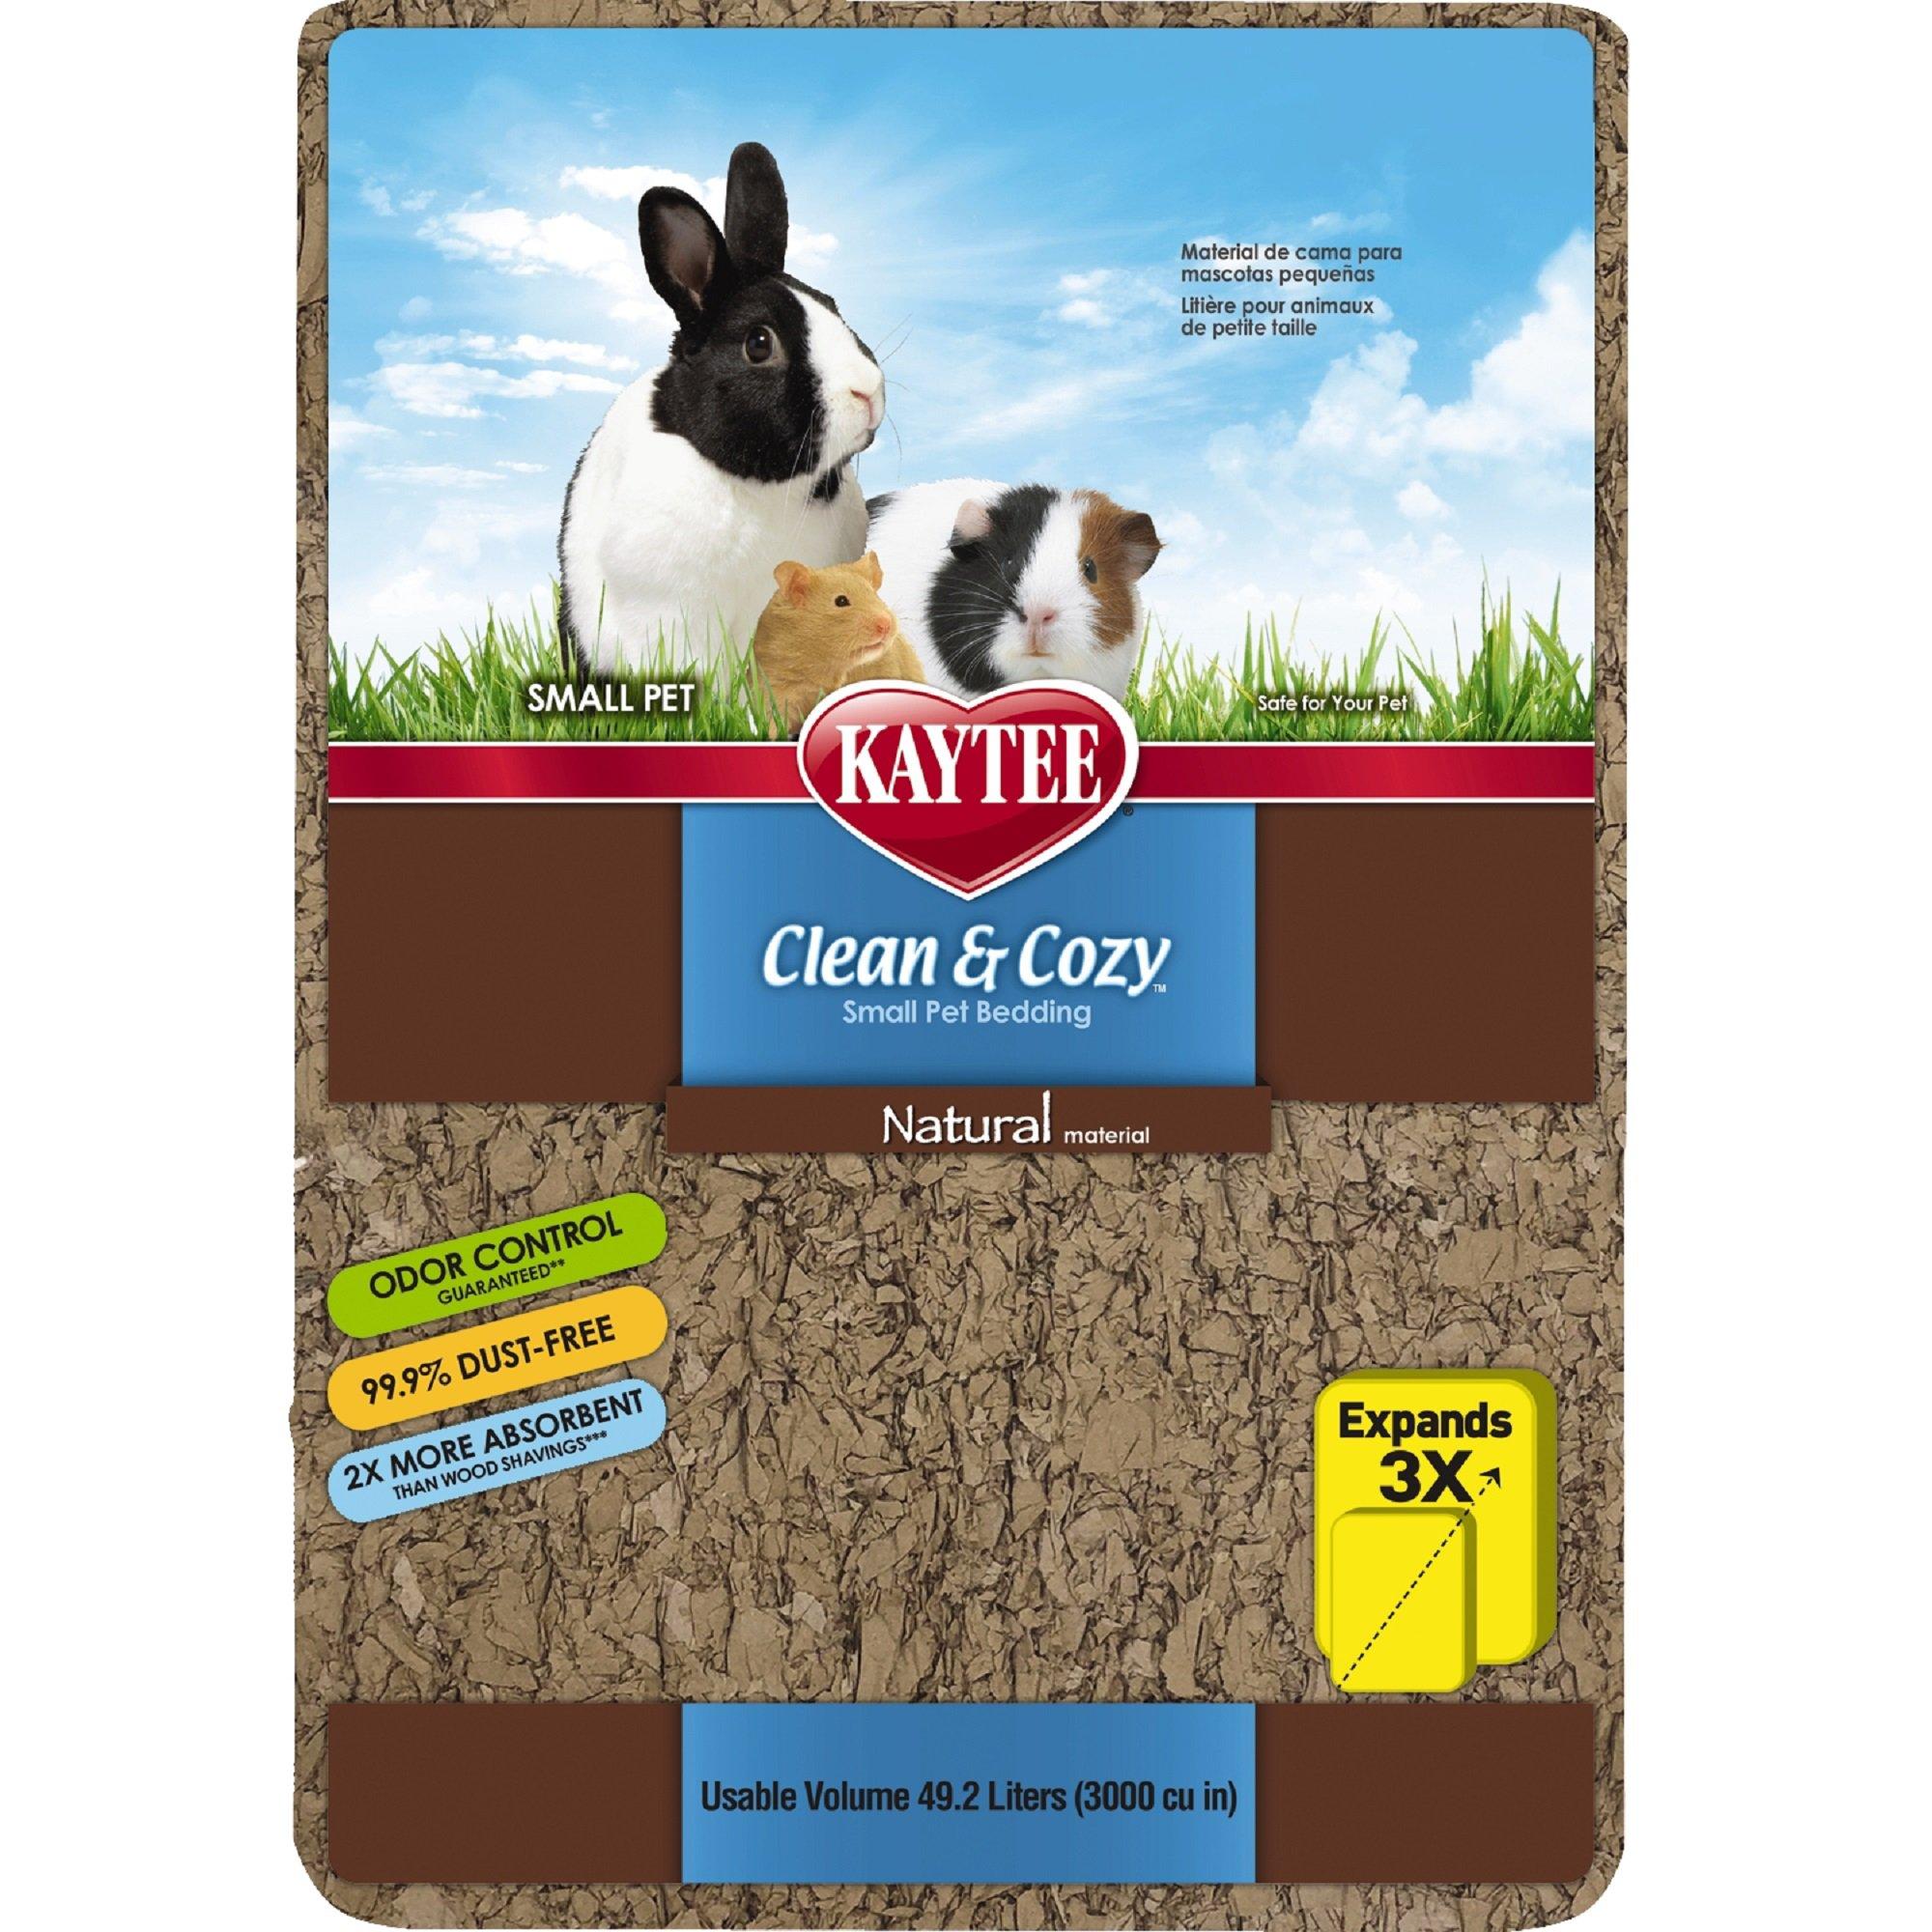 kaytee clean & cozy small animal bedding | petco